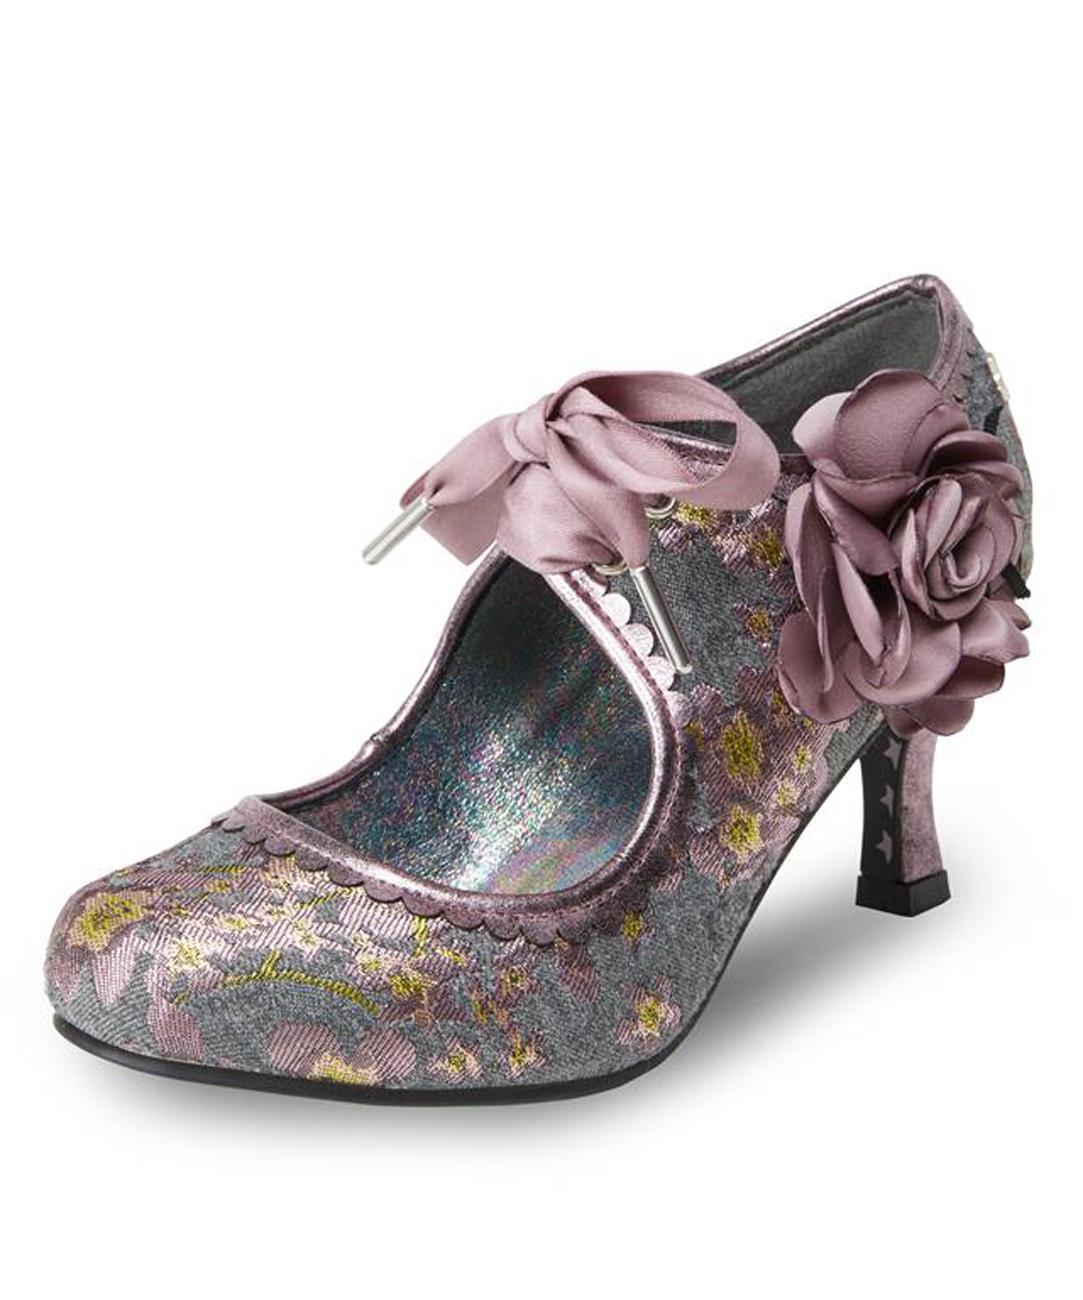 Joe Browns Rosalind Couture Court Shoe UK3-9 EU36-42 Grey Turquoise Tweed